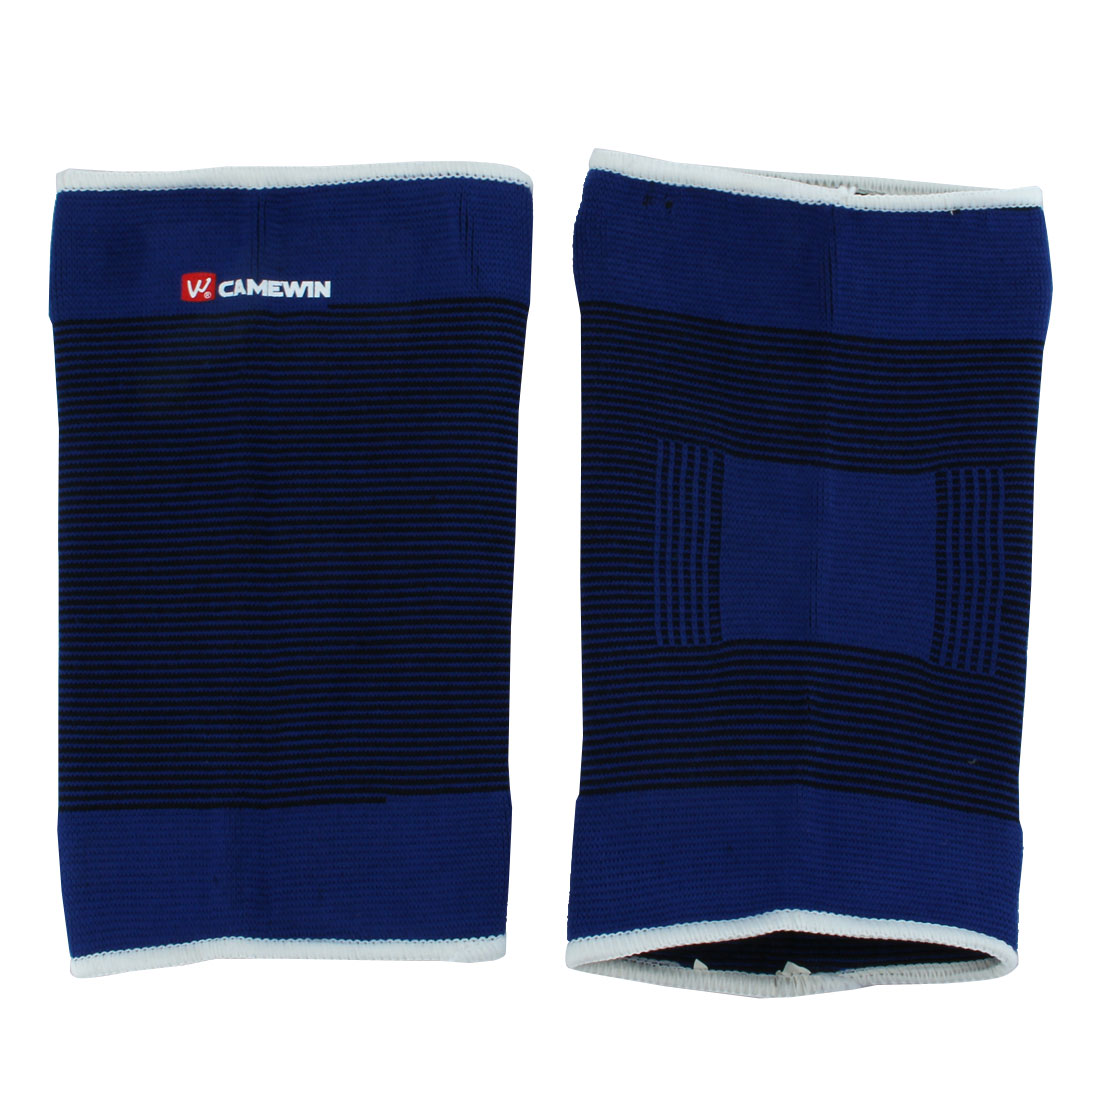 2pcs Thigh Leg Support Elastic Protect Brace Sport Bandage